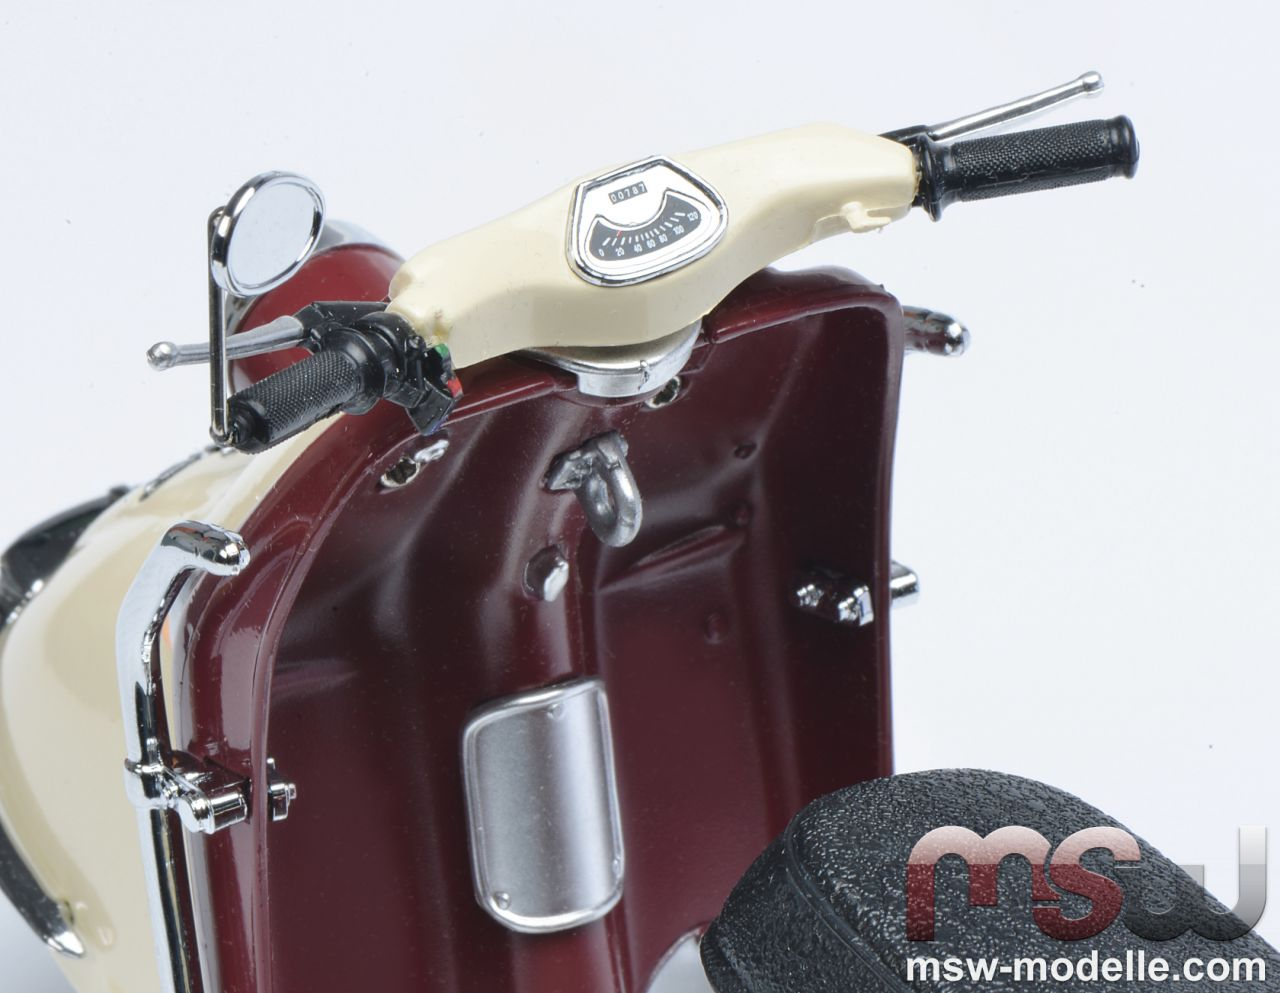 1 10 heinkel tourist 103 a2 mit fahrerfigur scooter. Black Bedroom Furniture Sets. Home Design Ideas